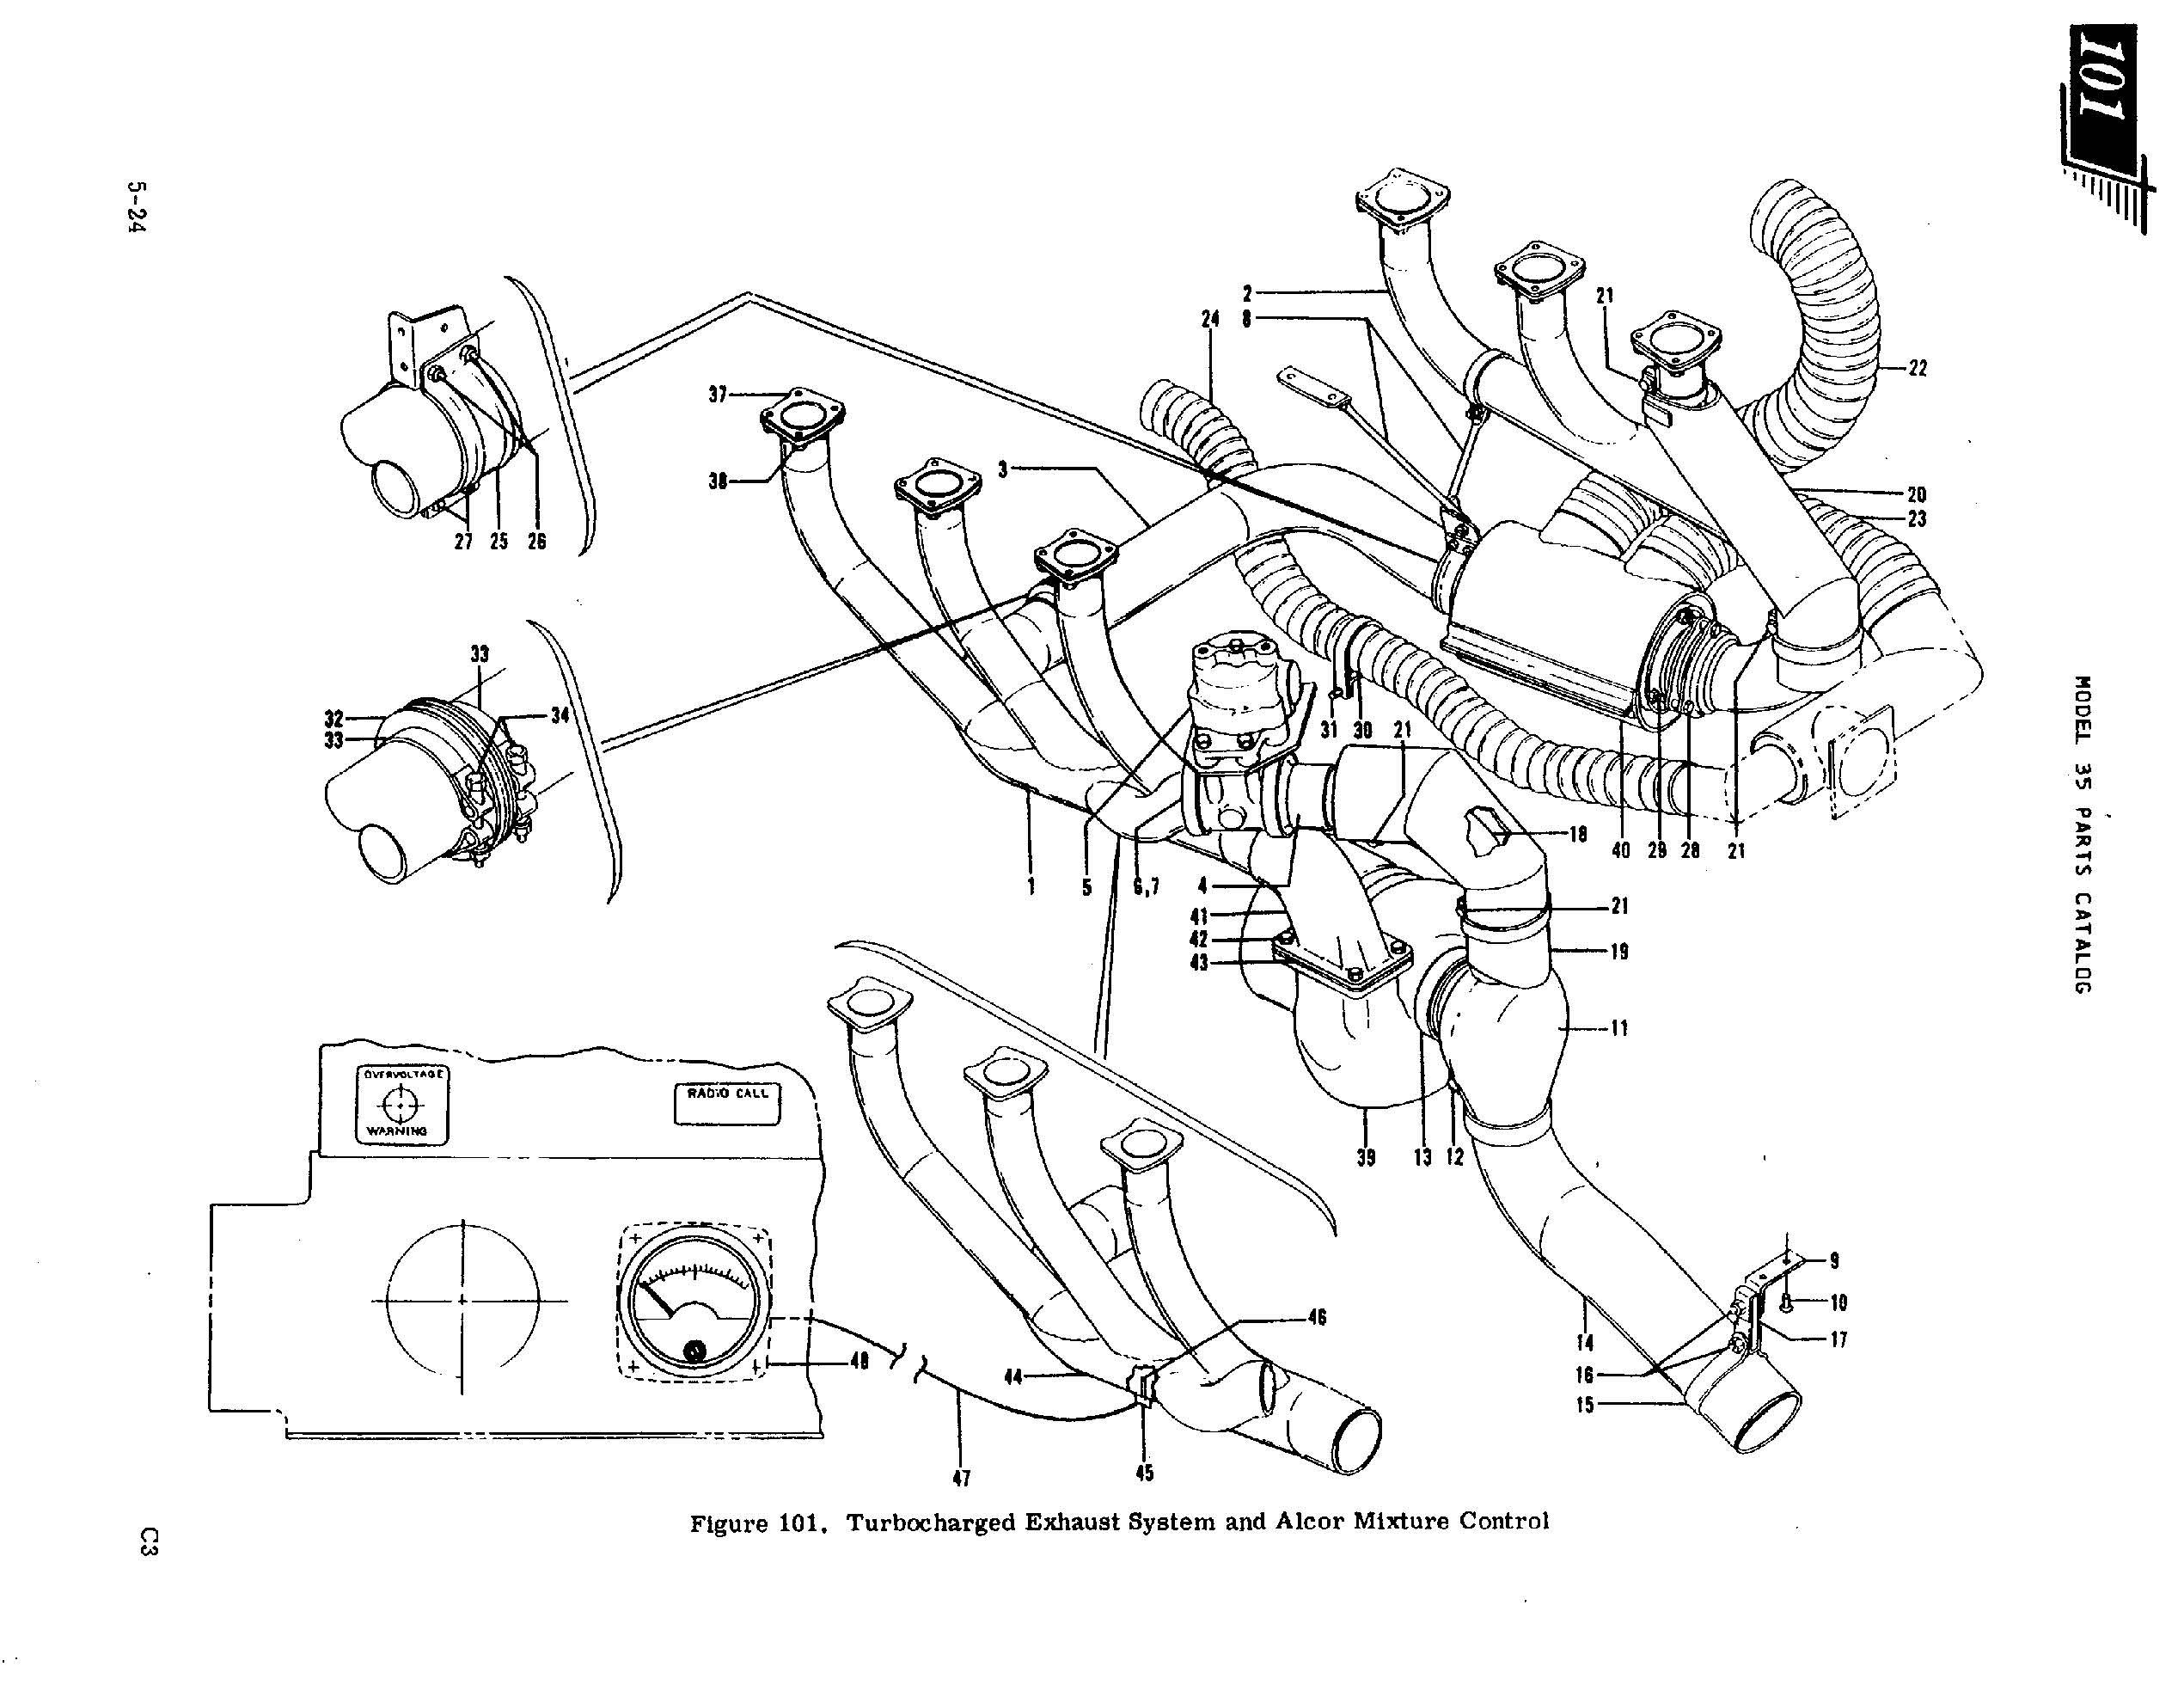 autoloc flamethrower kit wiring diagram e36 exhaust